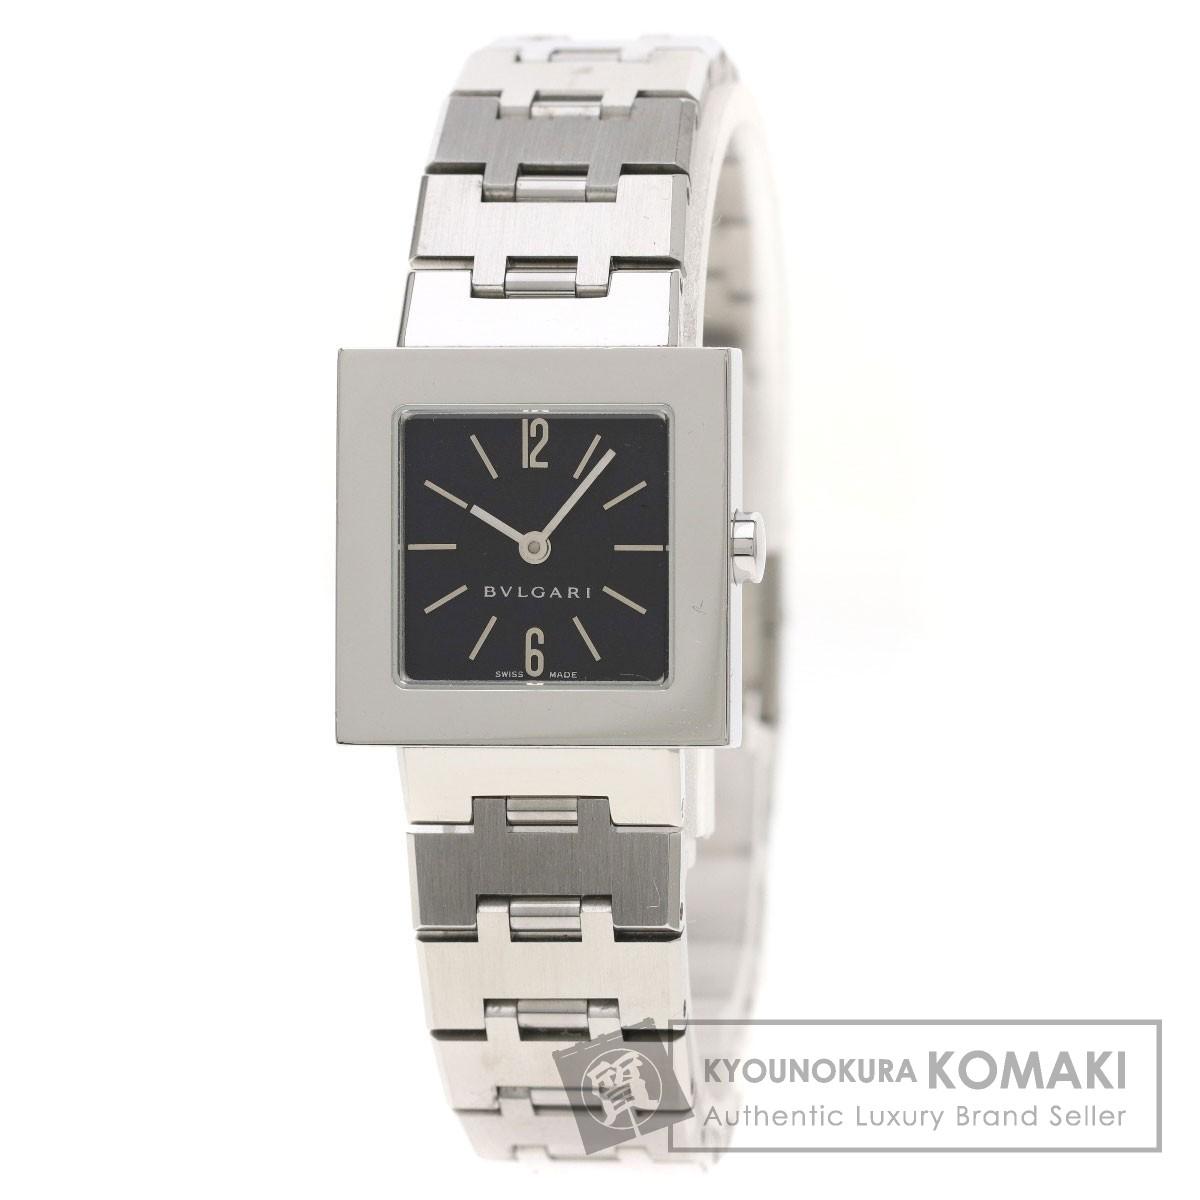 BVLGARI SQ22SS 腕時計 ステンレス レディース 【中古】【ブルガリ】